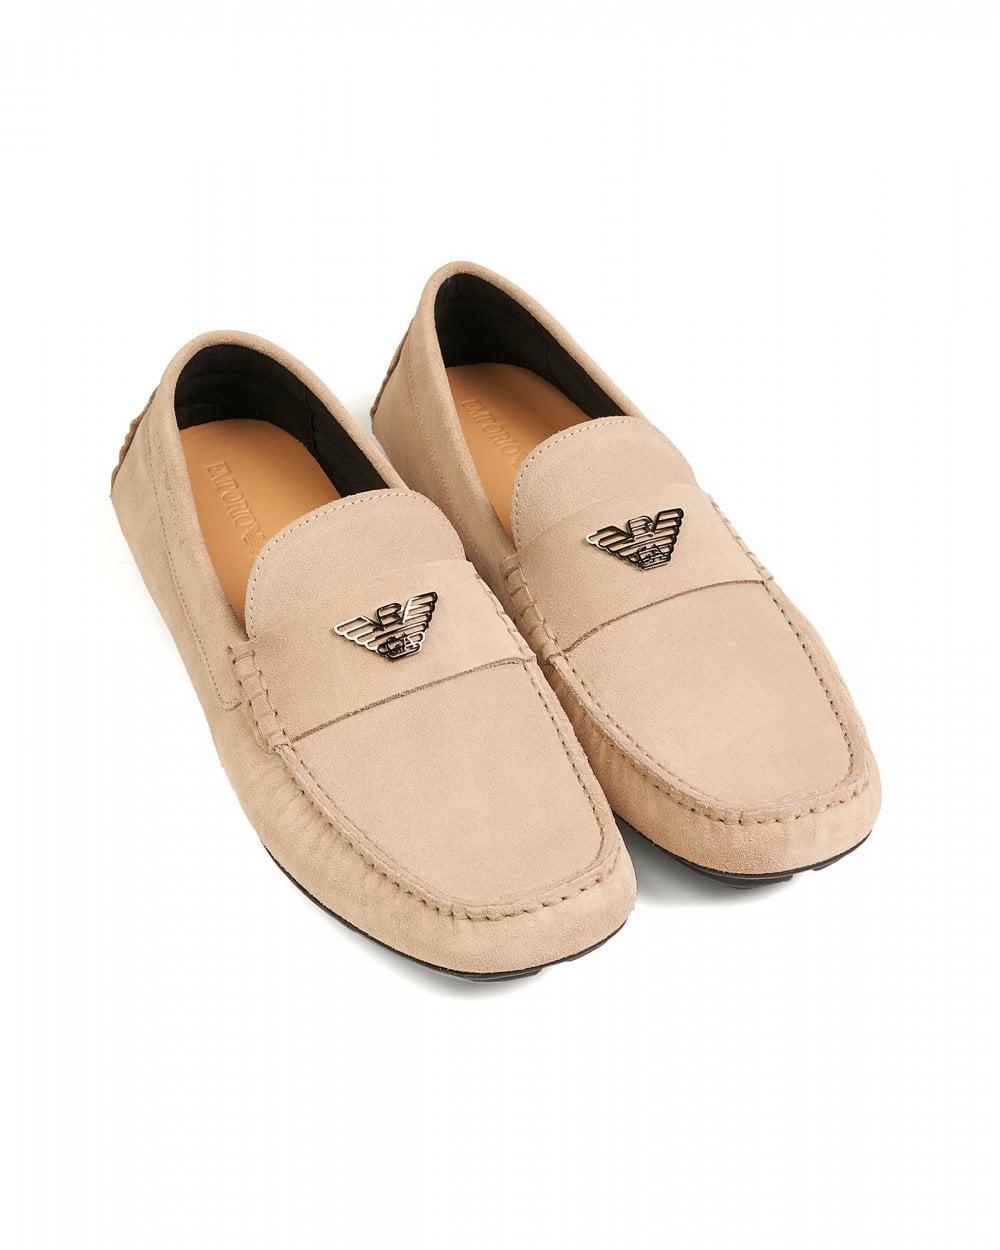 80593ac9072 Emporio Armani Mens Beige Driver Shoes